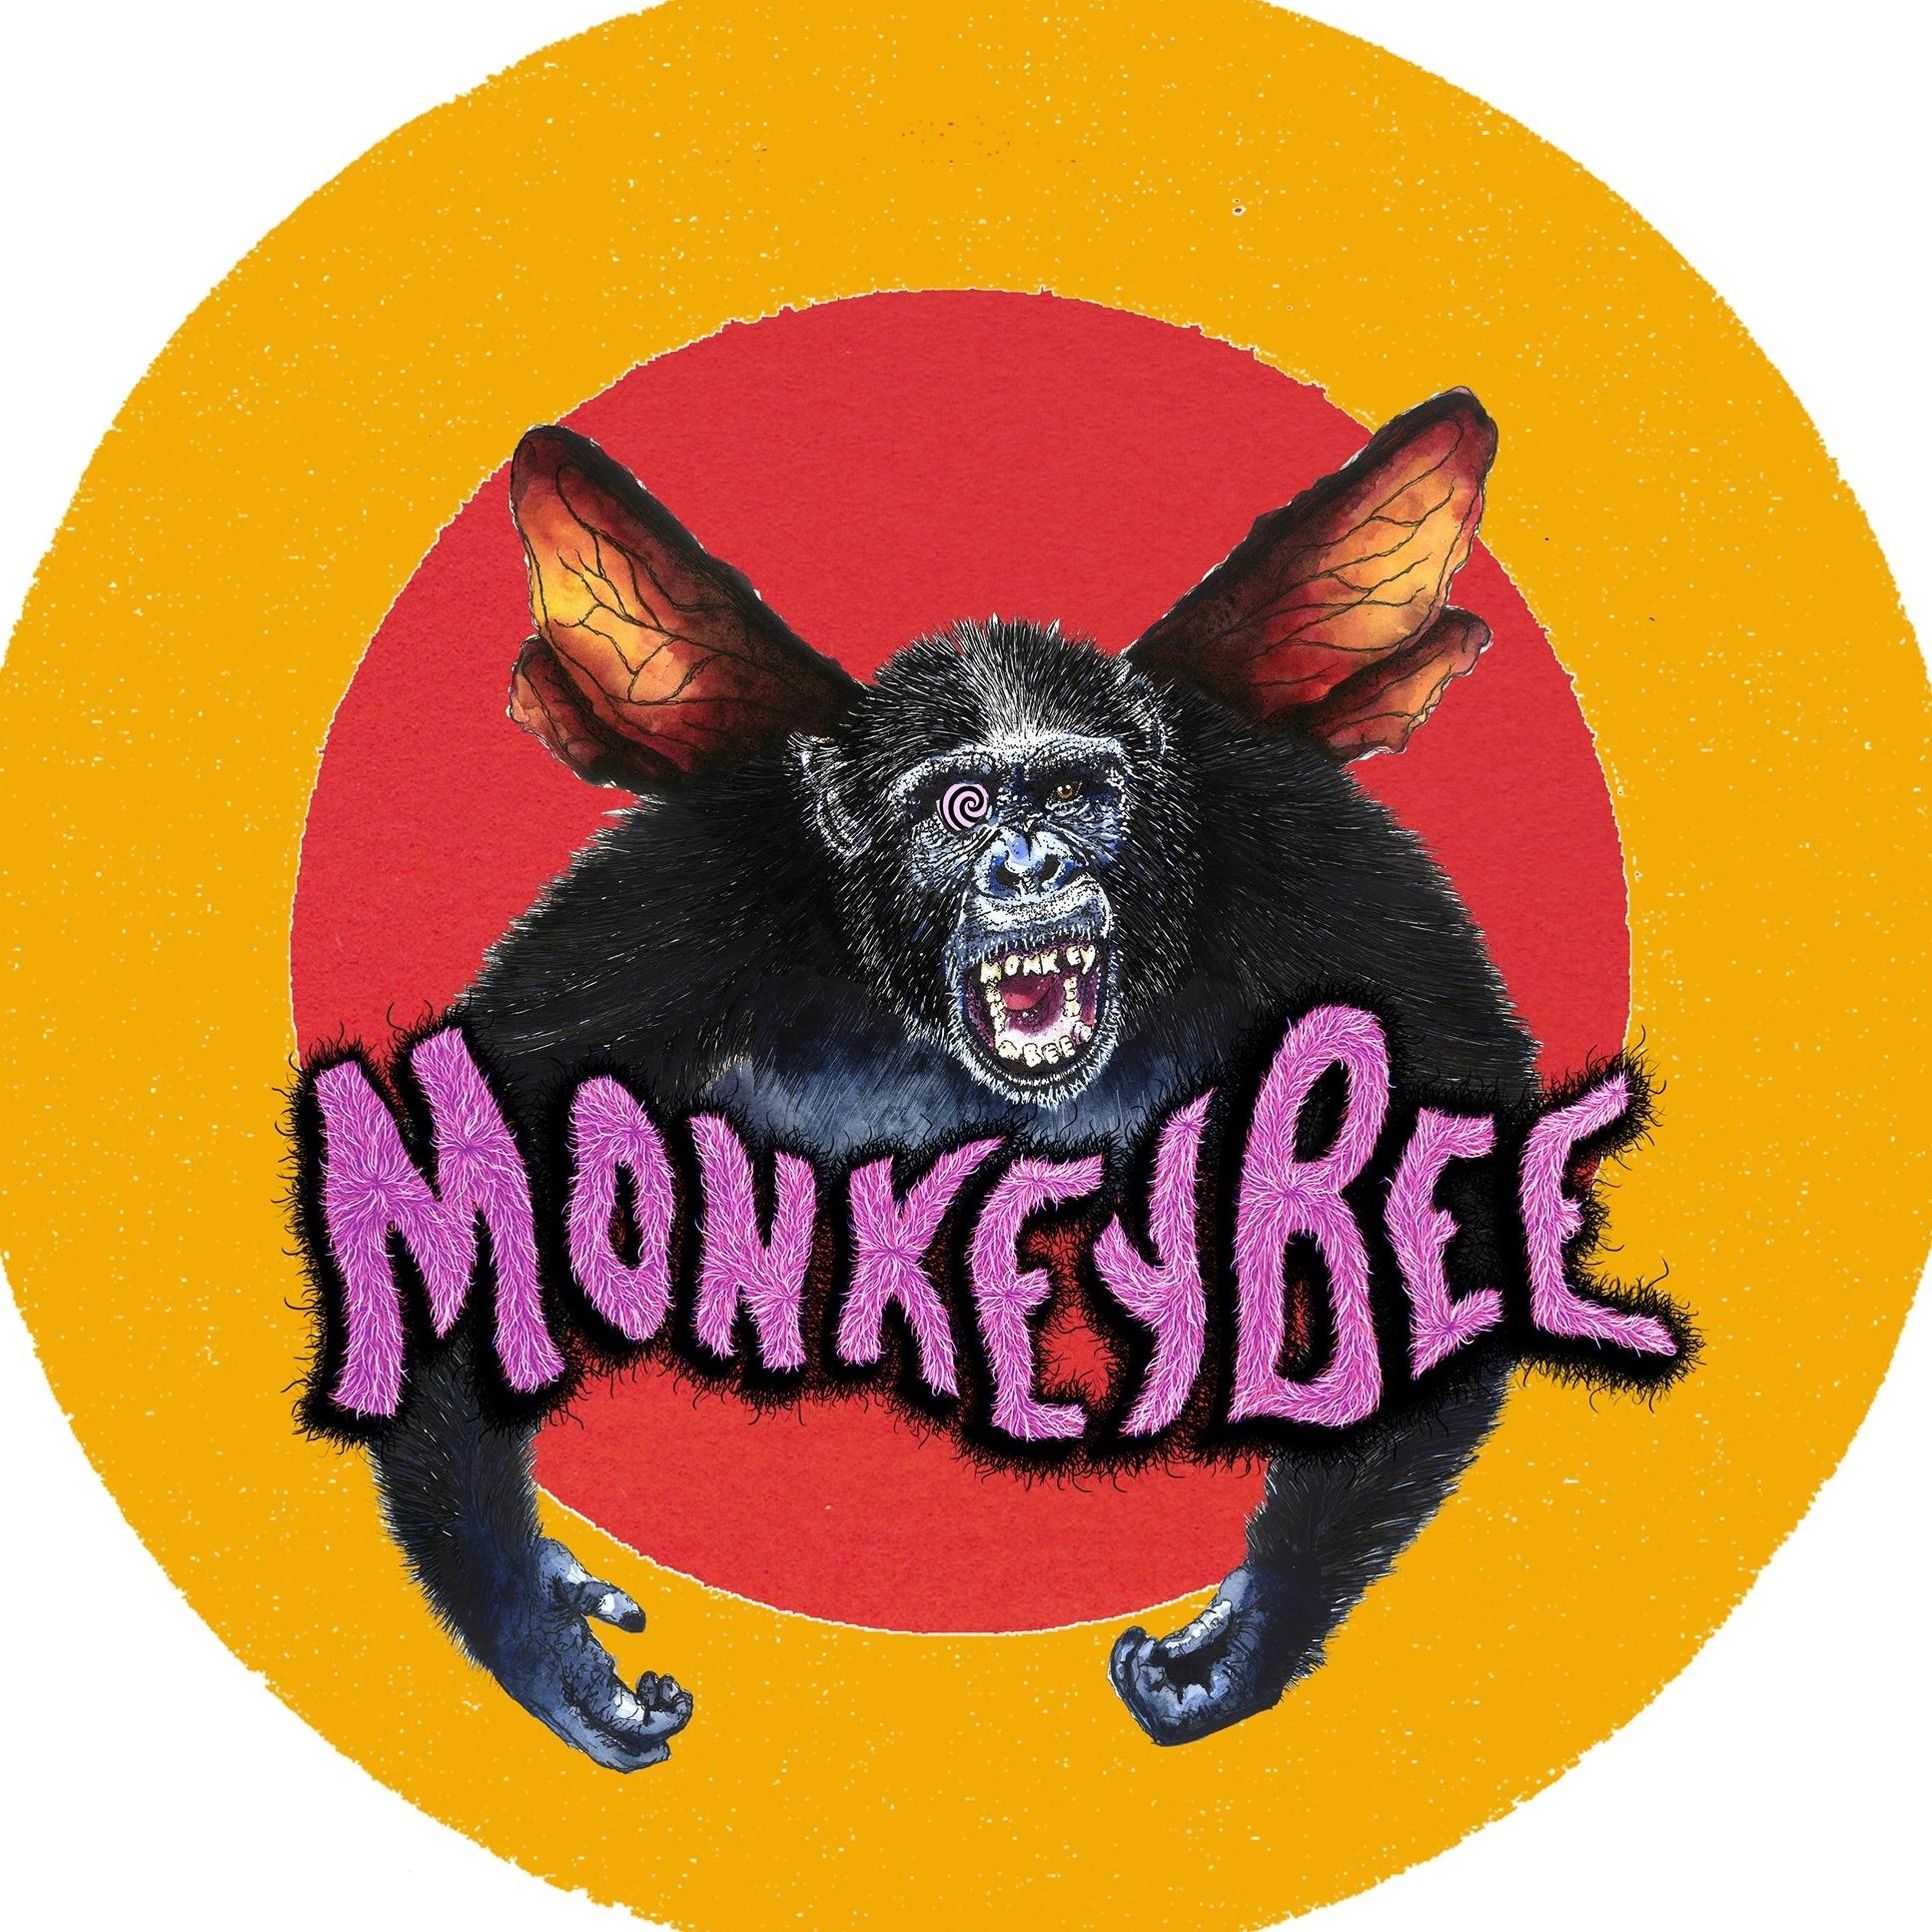 Influences: Monkeybee Festival